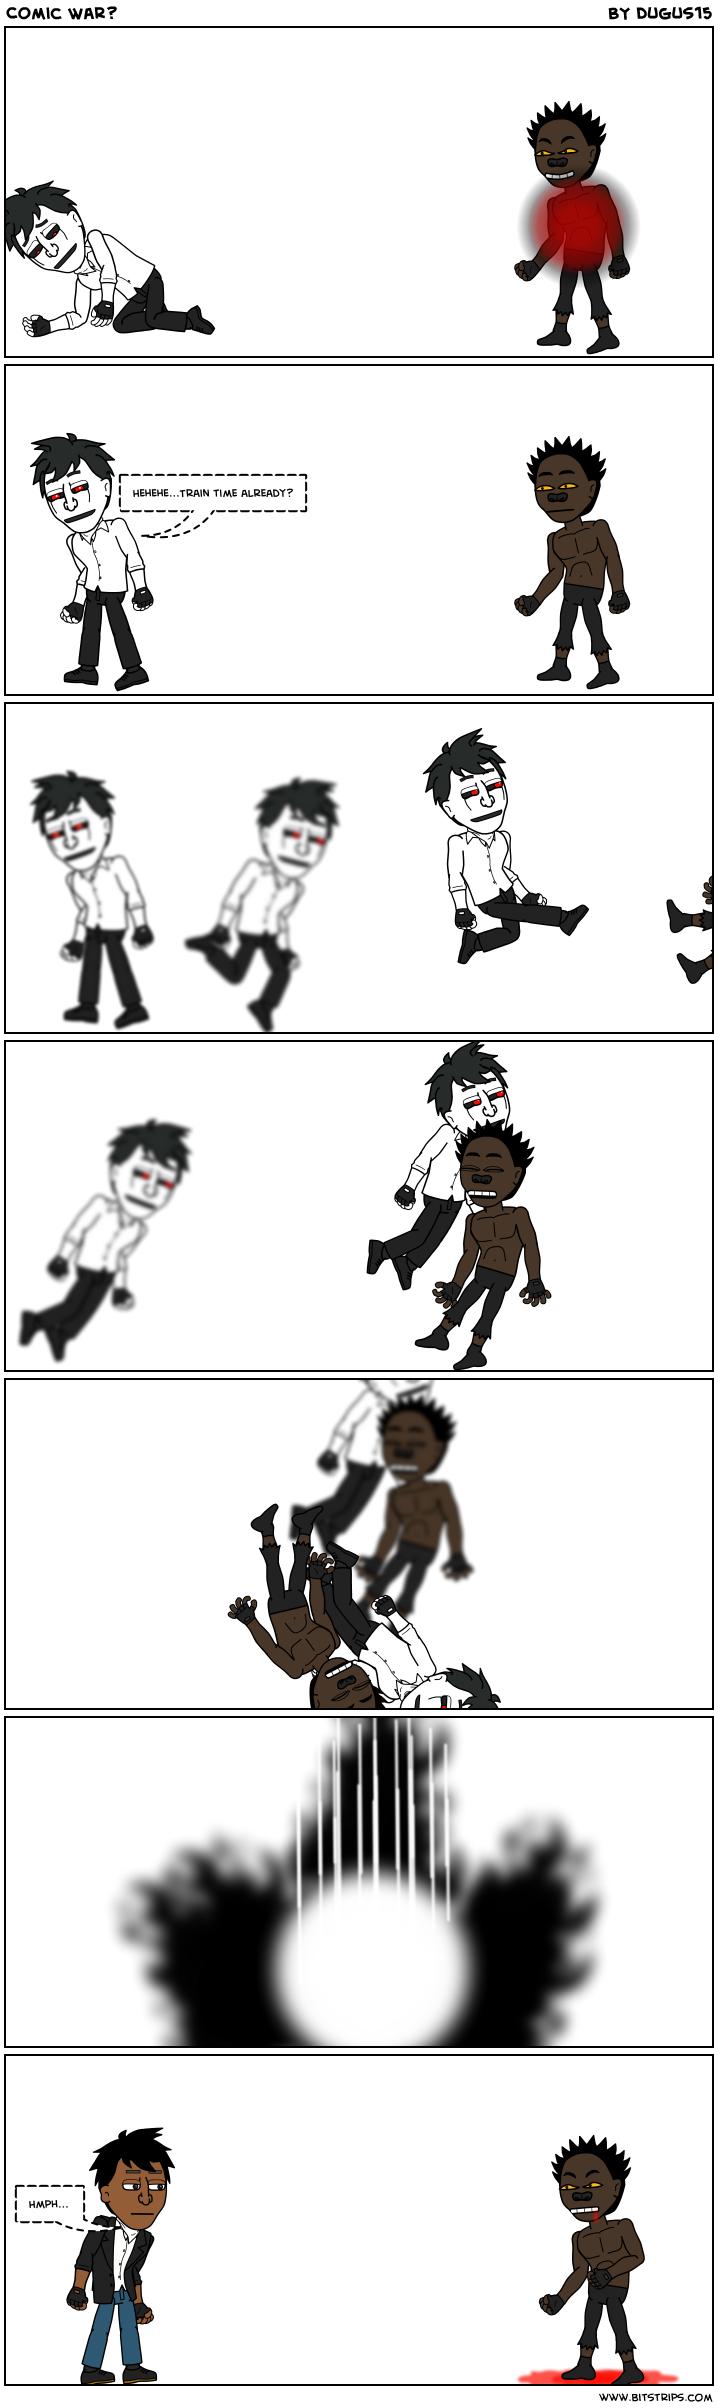 Comic War?